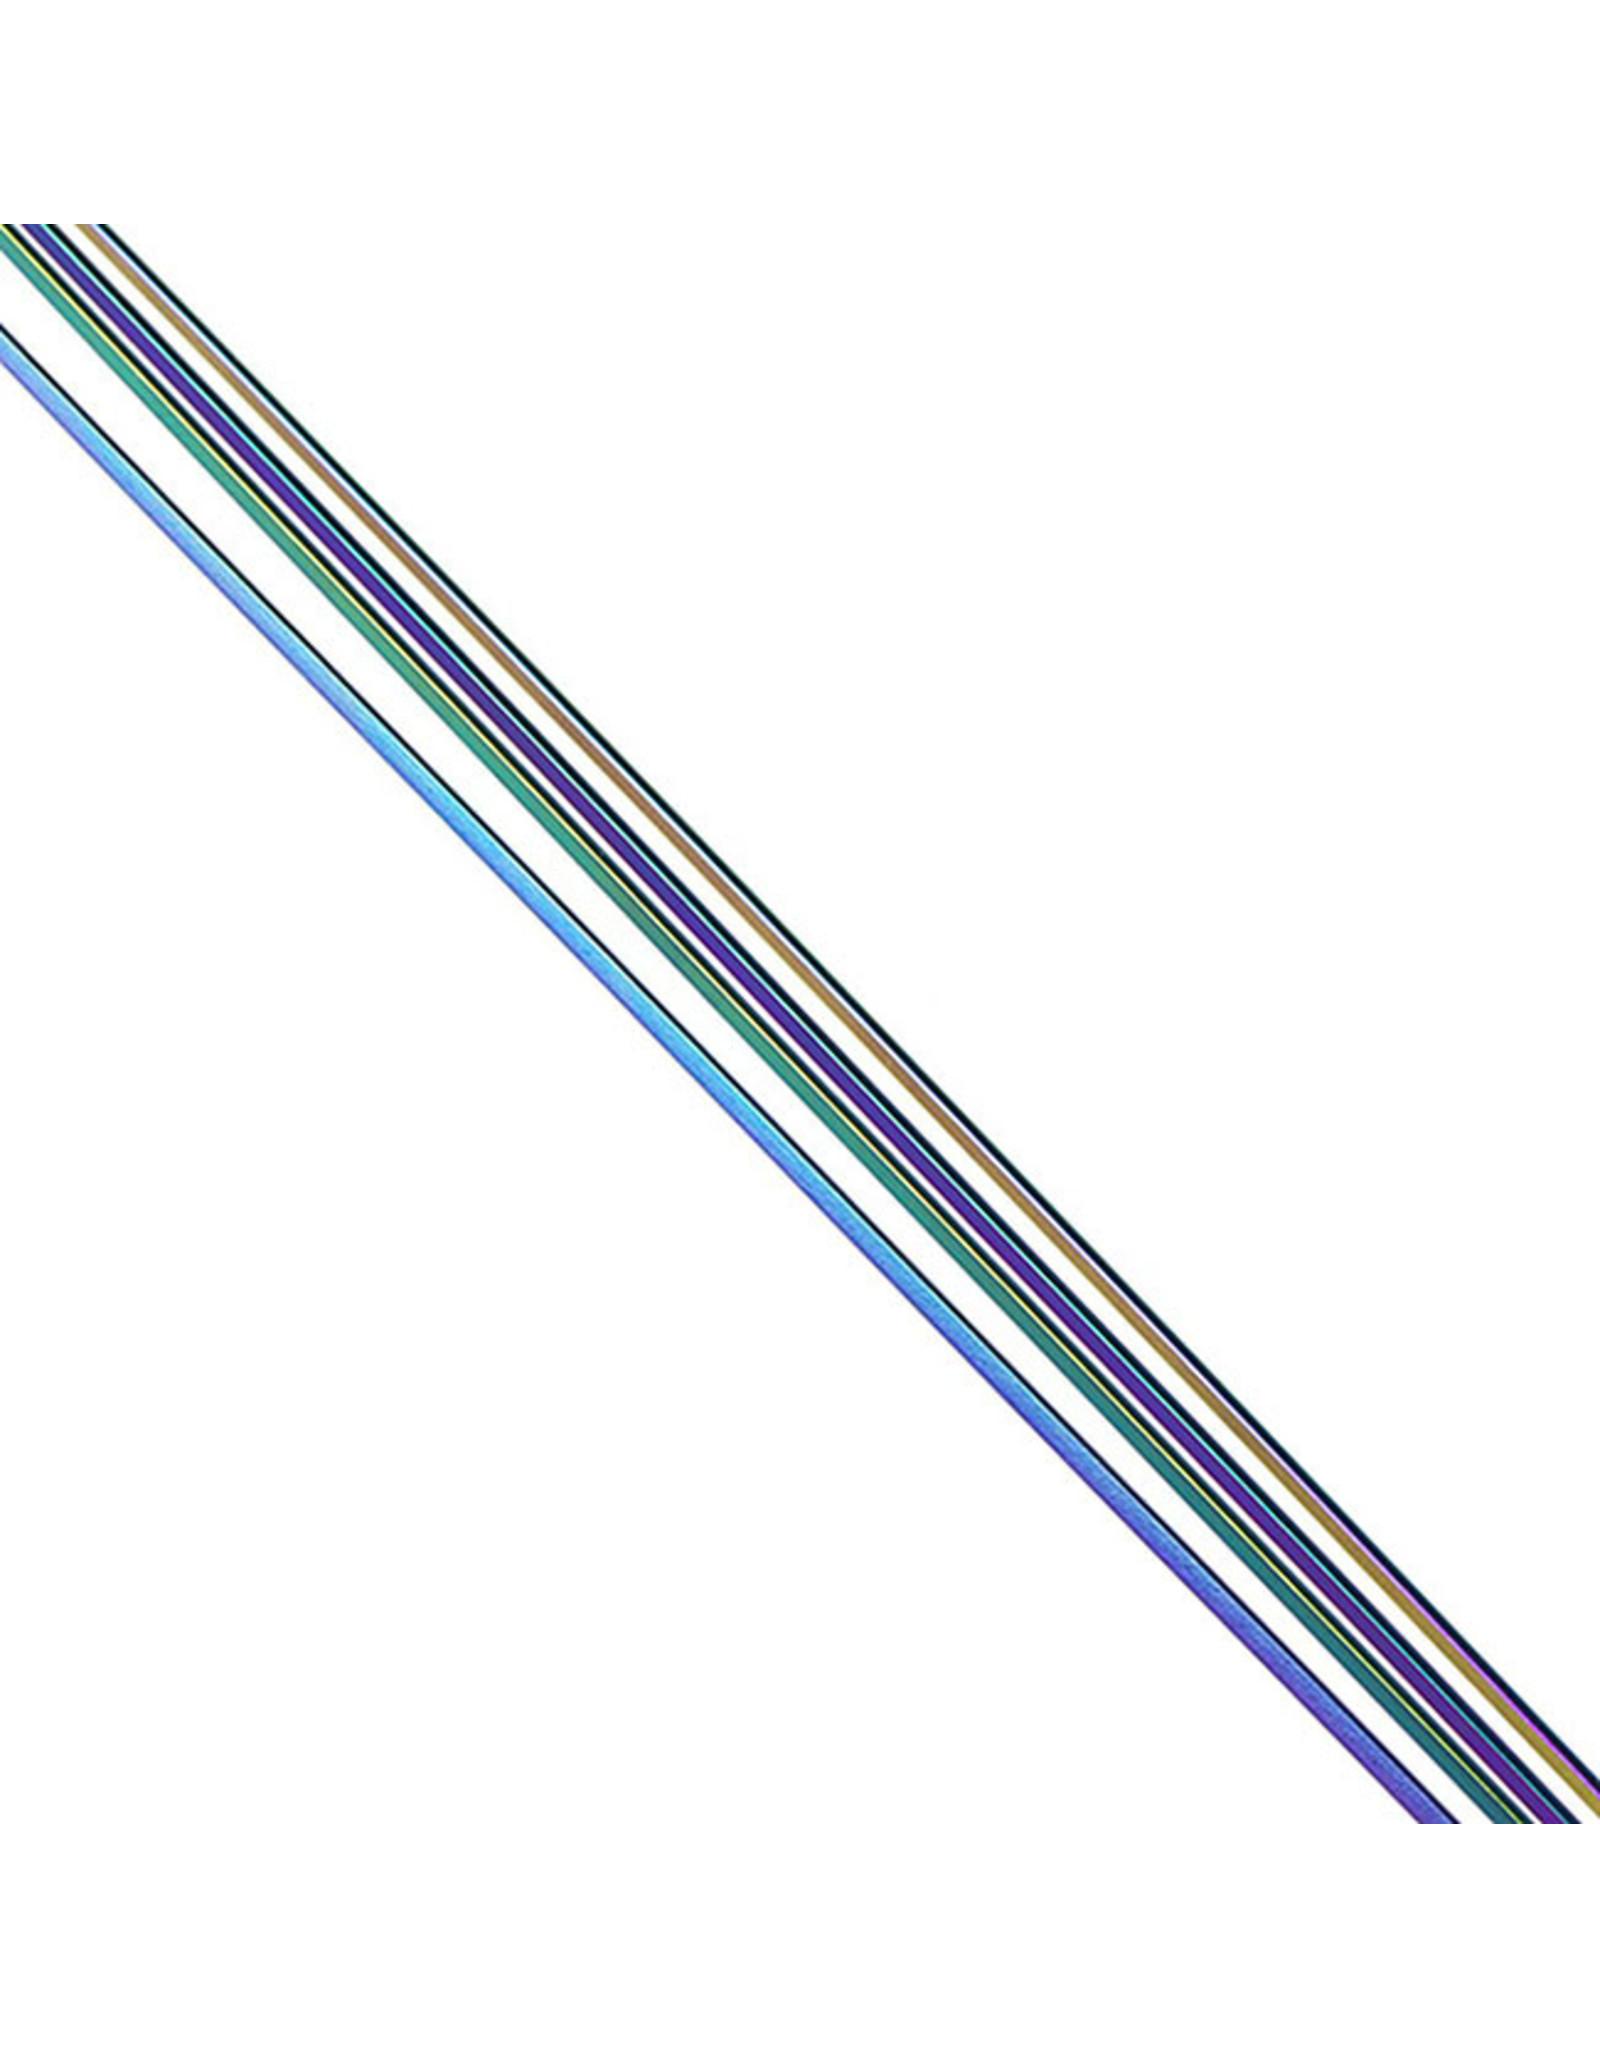 Pillar Spokes Pillar 1422 Bladed SS Rainbow Spokes